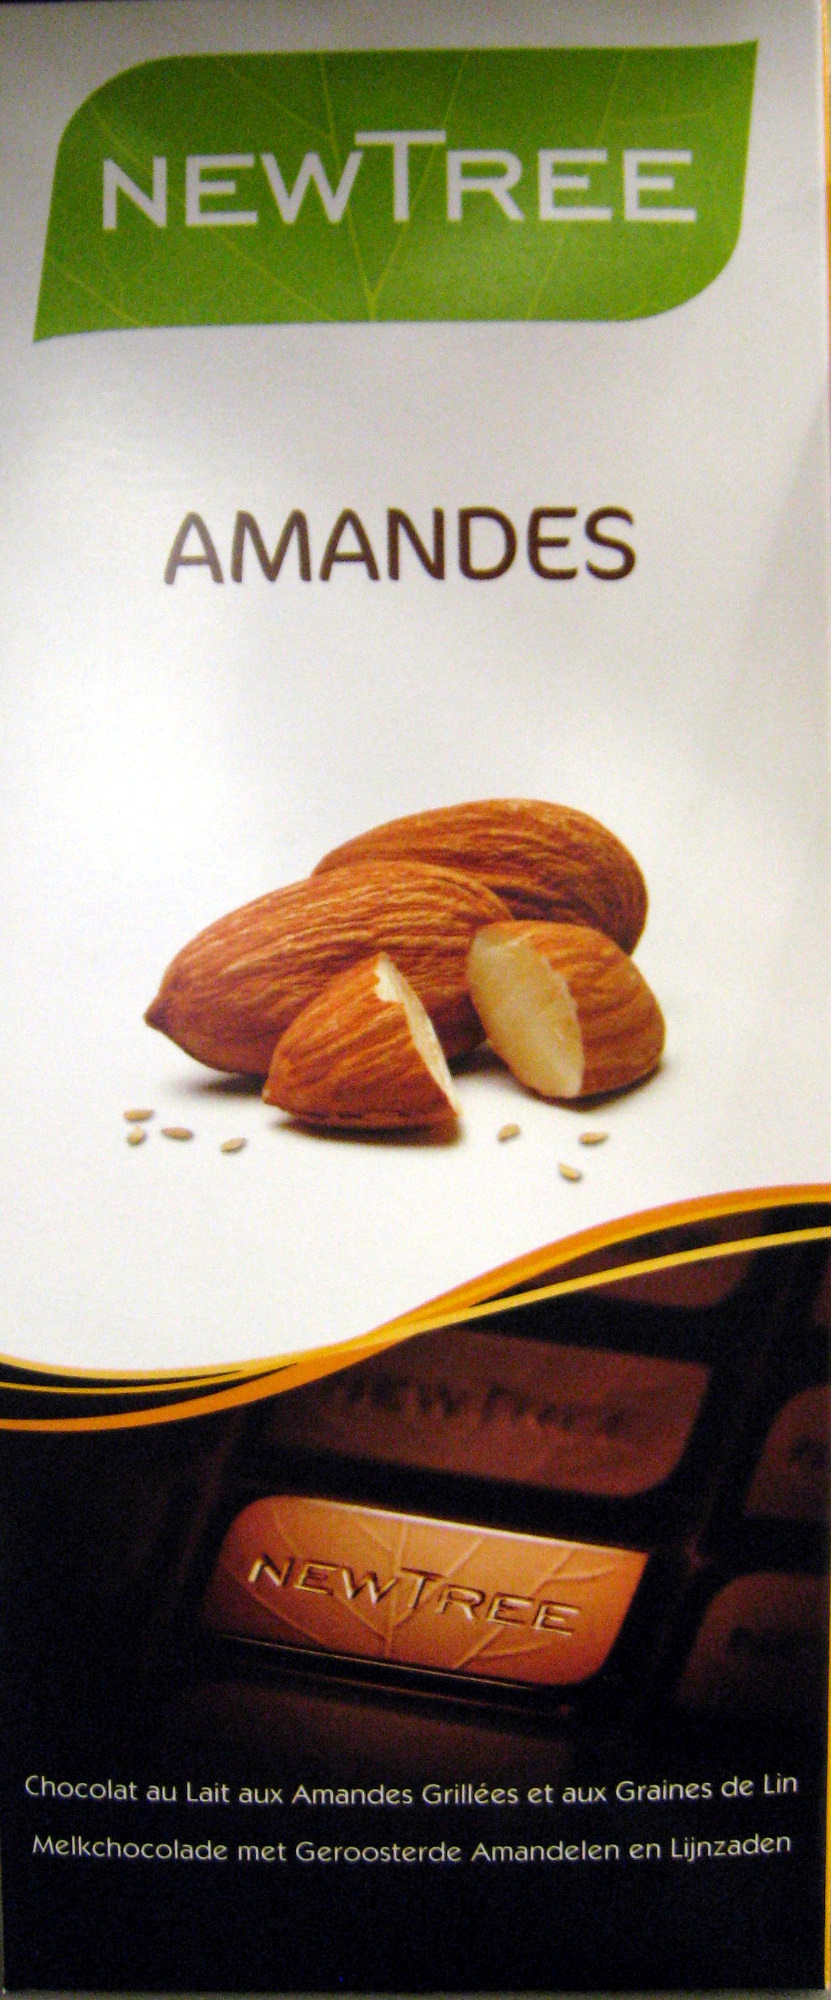 Chocolat Amandes NewTree - Produit - fr